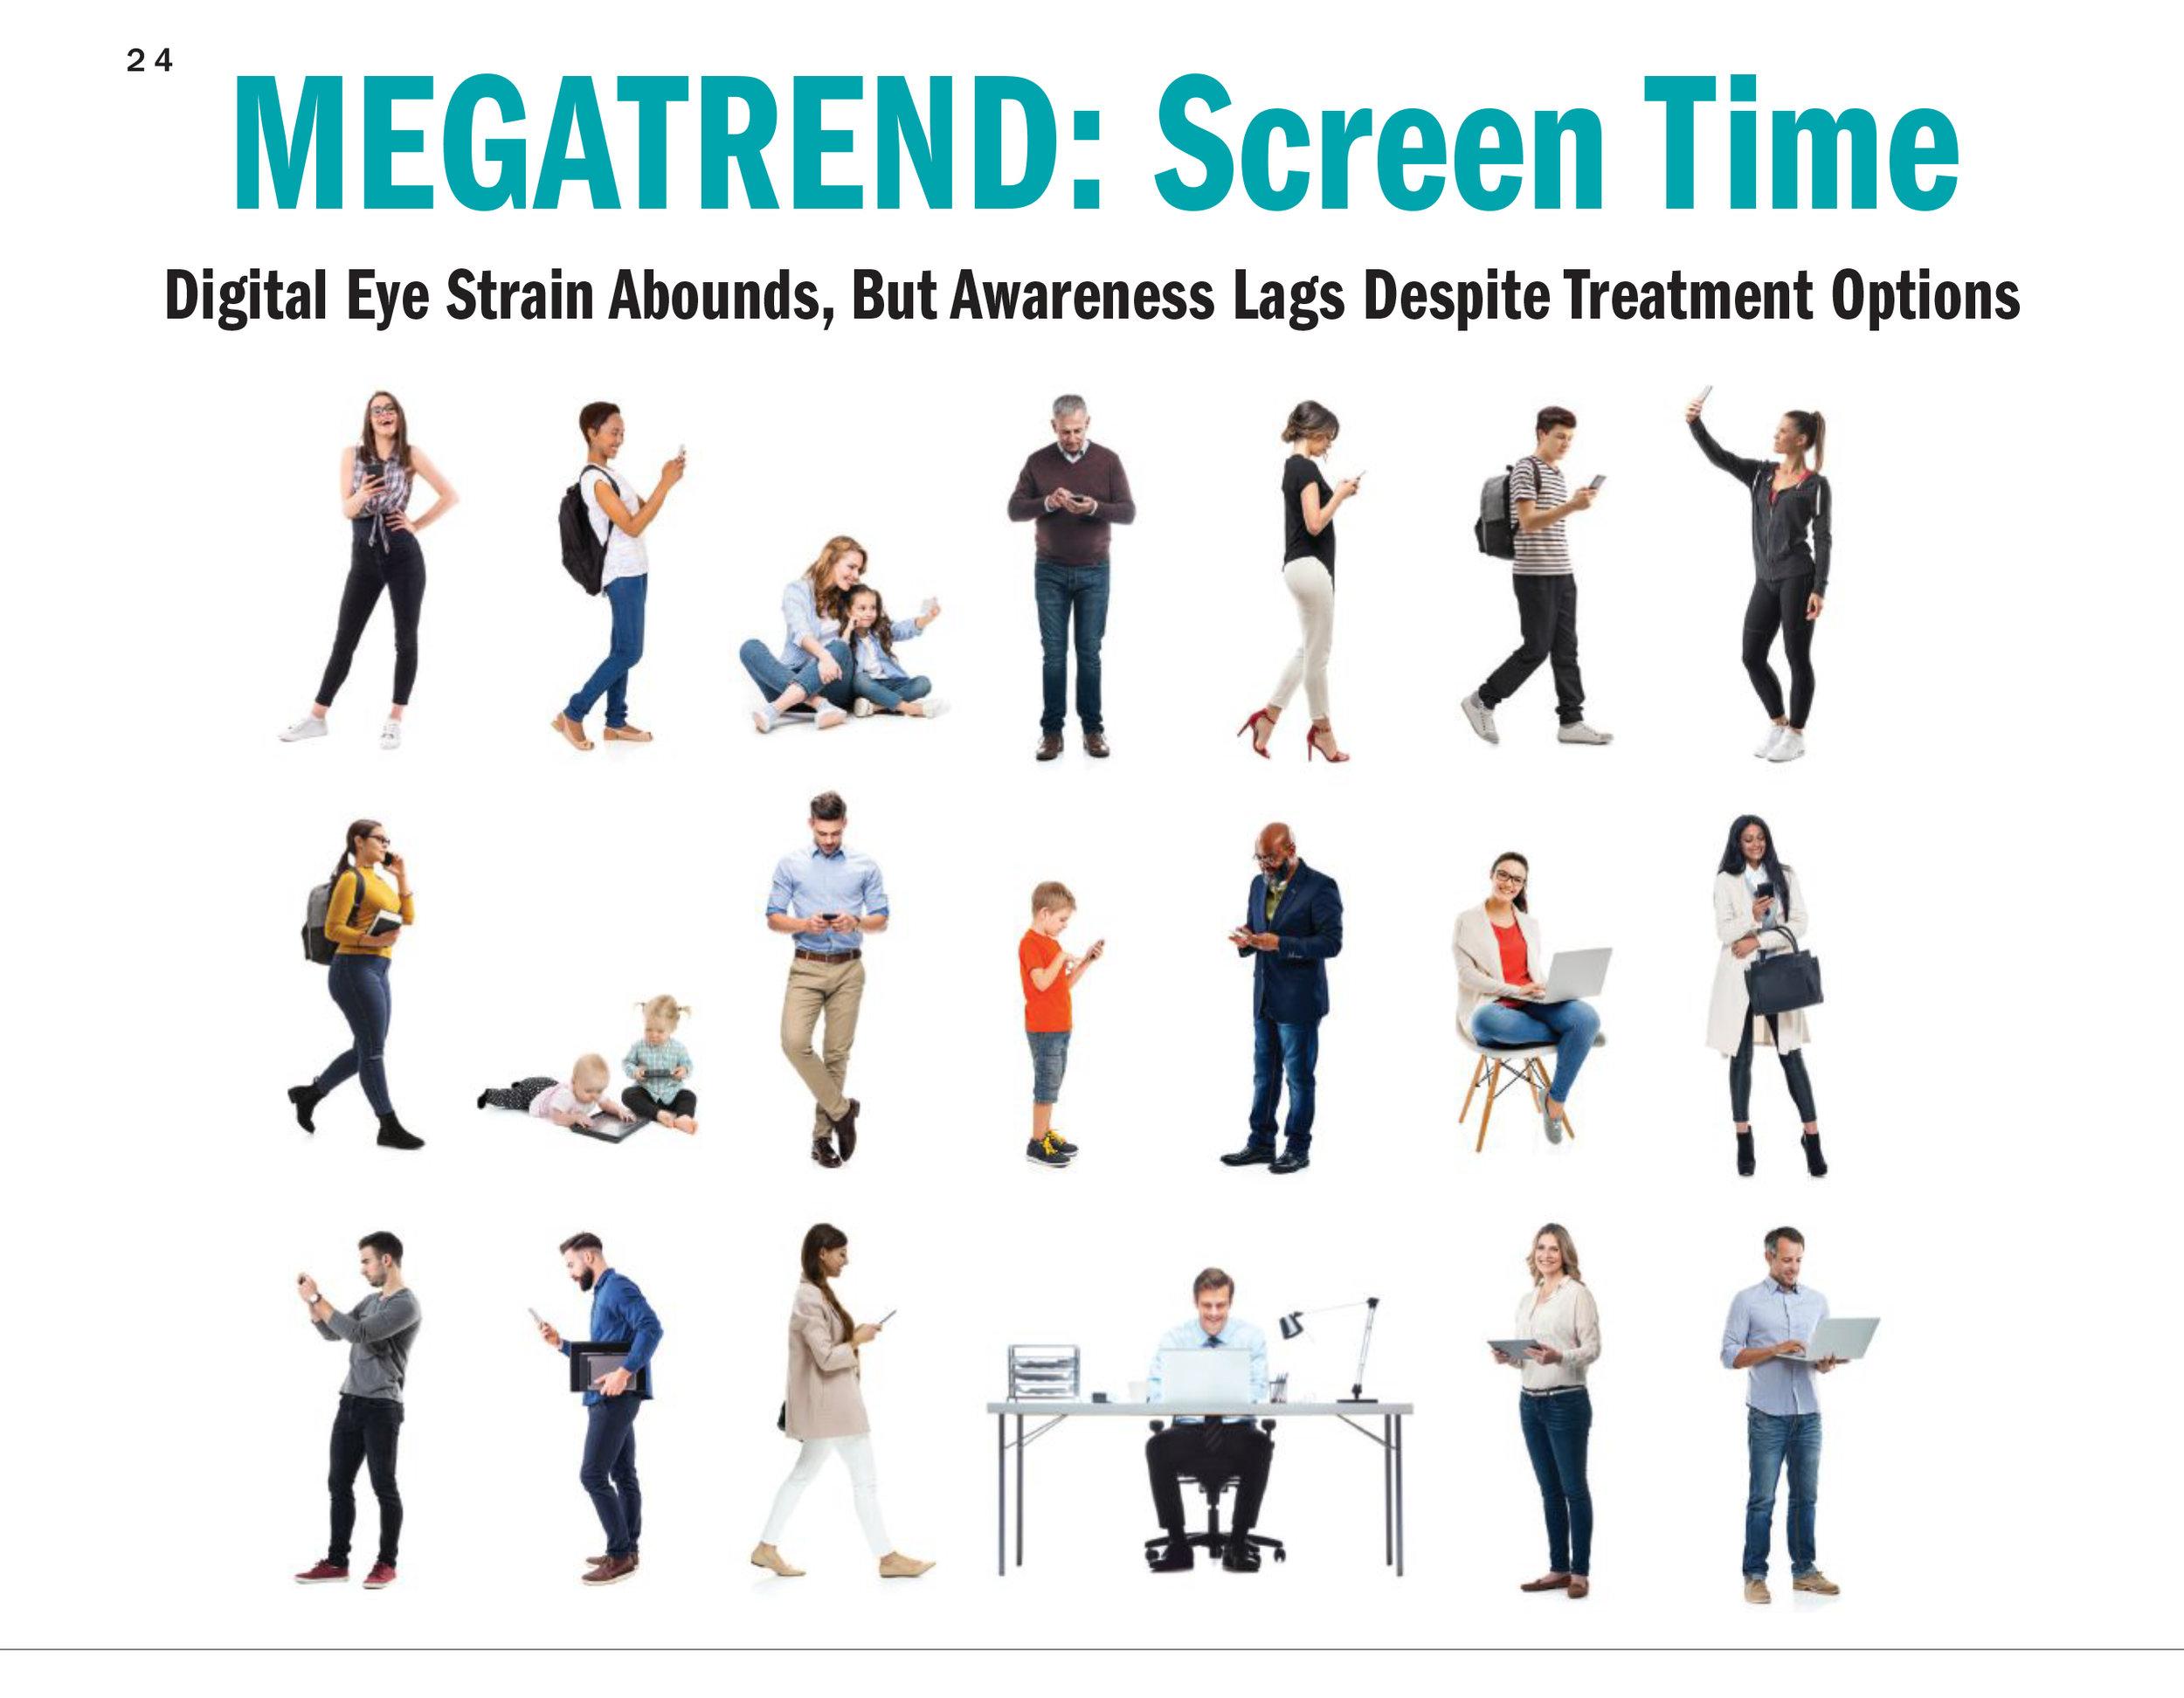 01-2019 VM issue_Digital Eyestrain_article (dragged) 3.jpg